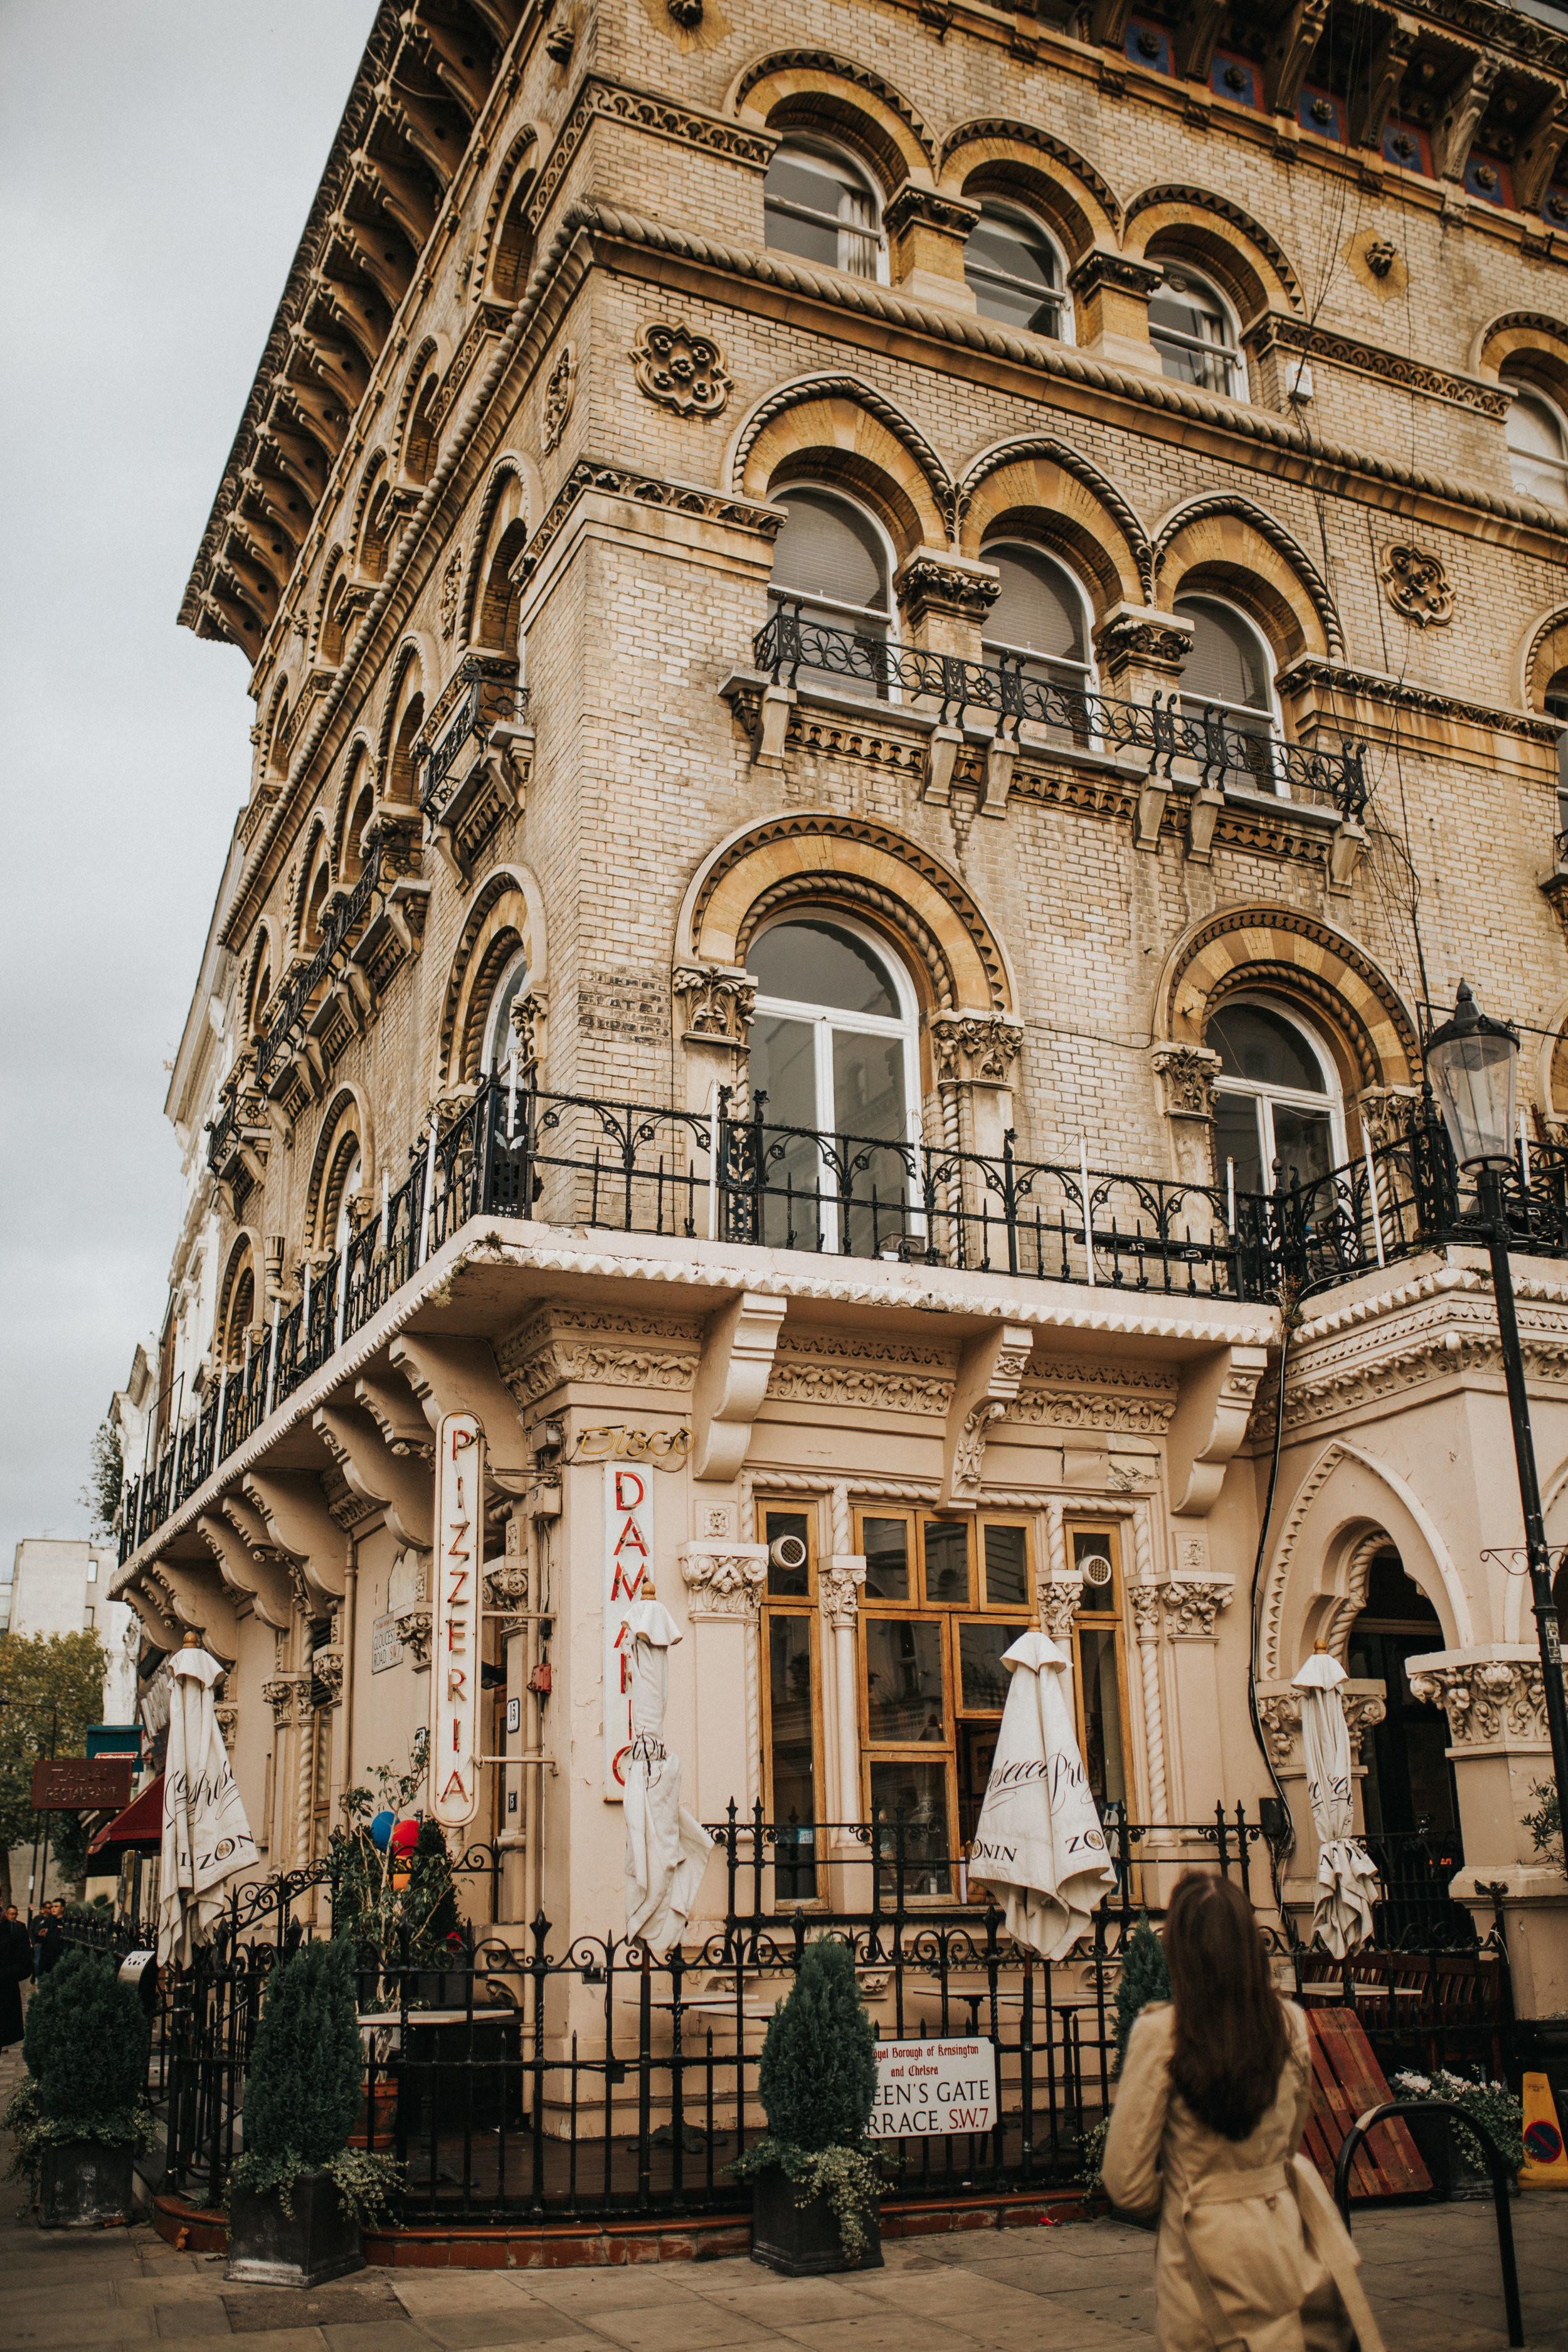 London Travel Photography - Knightsbridge